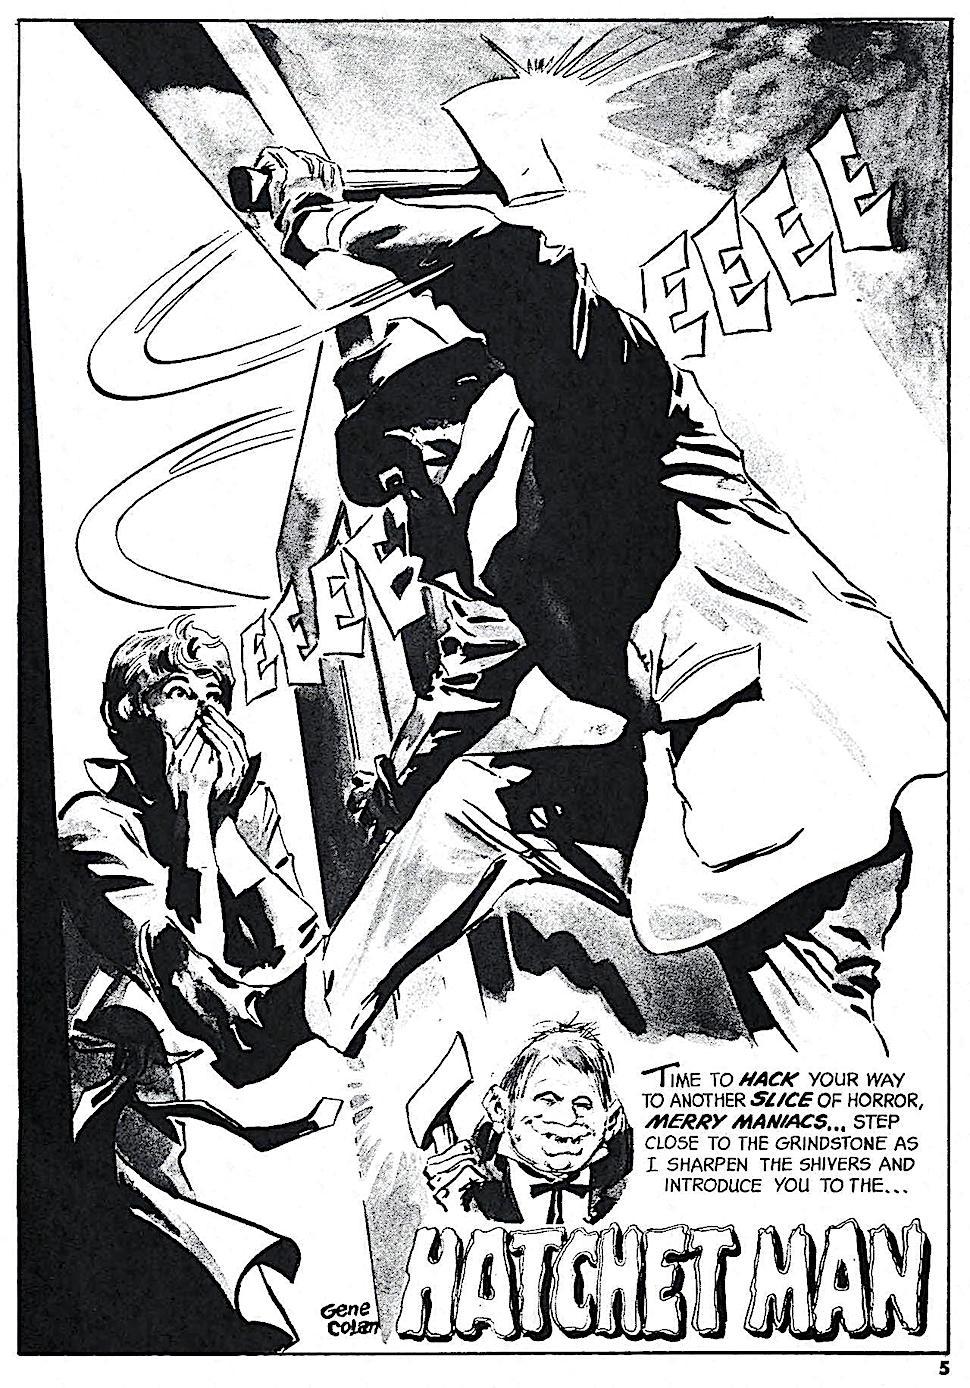 a Gene Colan 1971 horror story panel for Eerie magazine